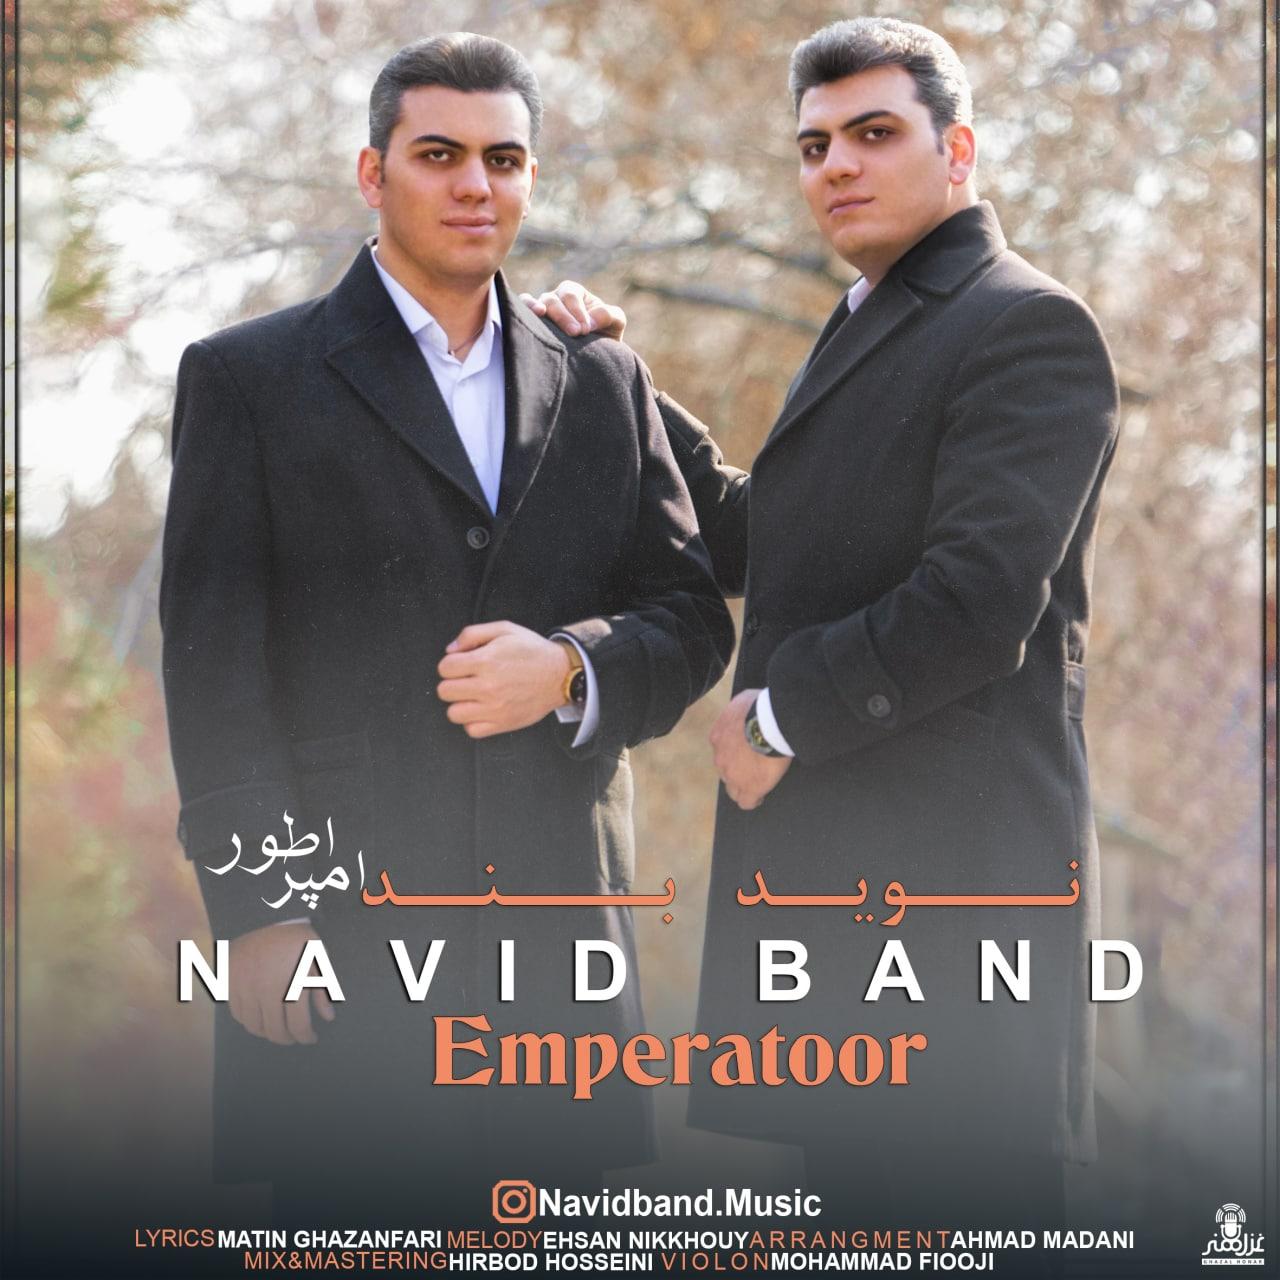 Navid Band – Emperatoor